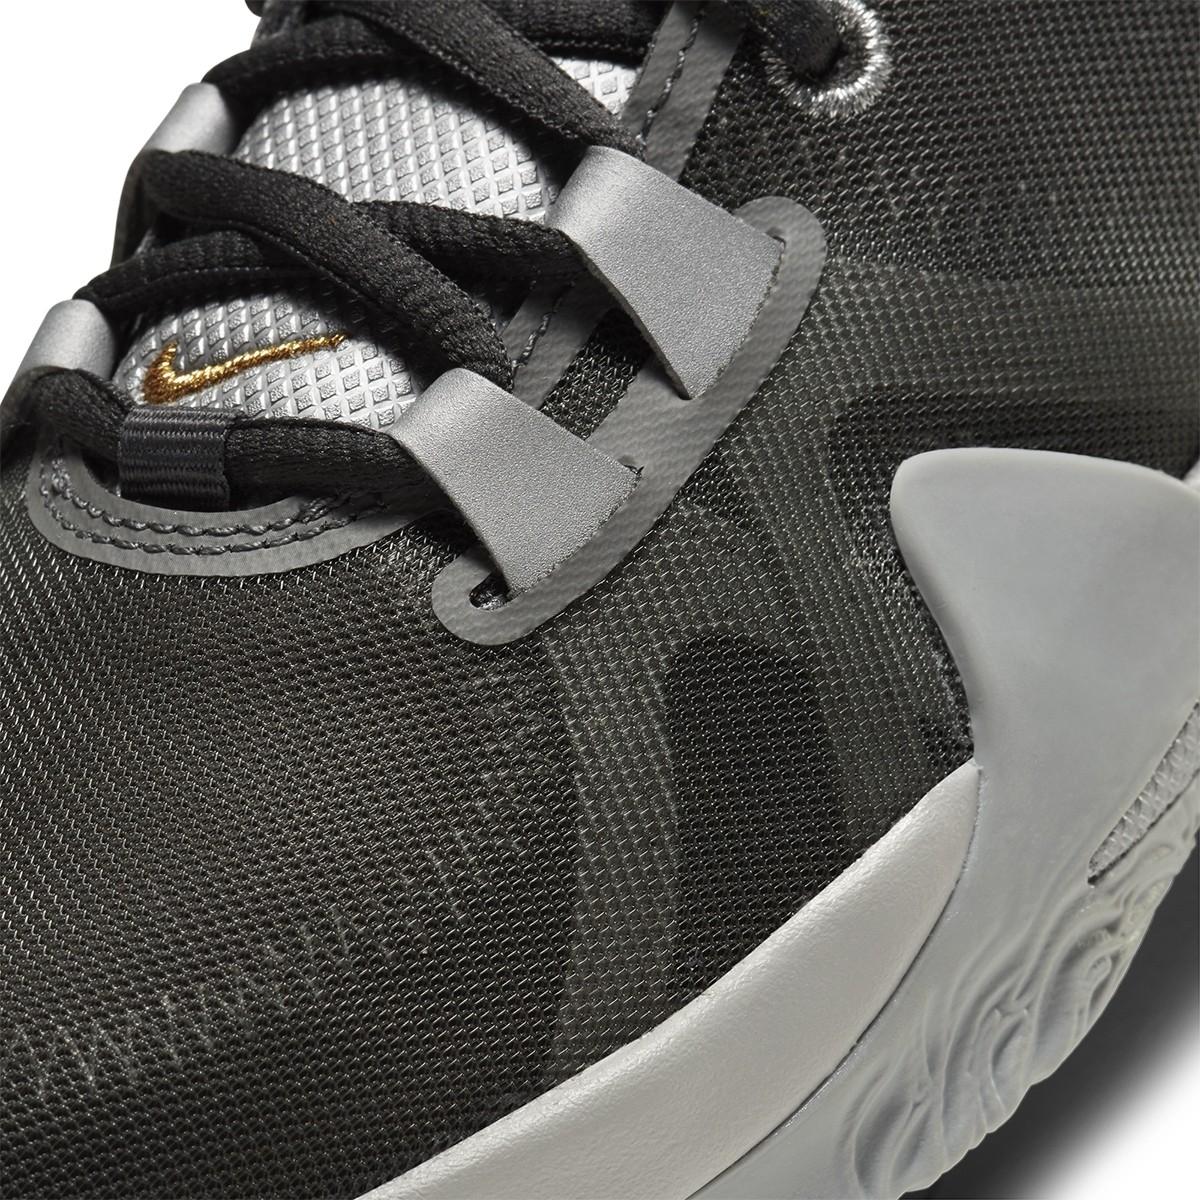 Nike Freak GS 'Smoke Grey'-BQ5633-050